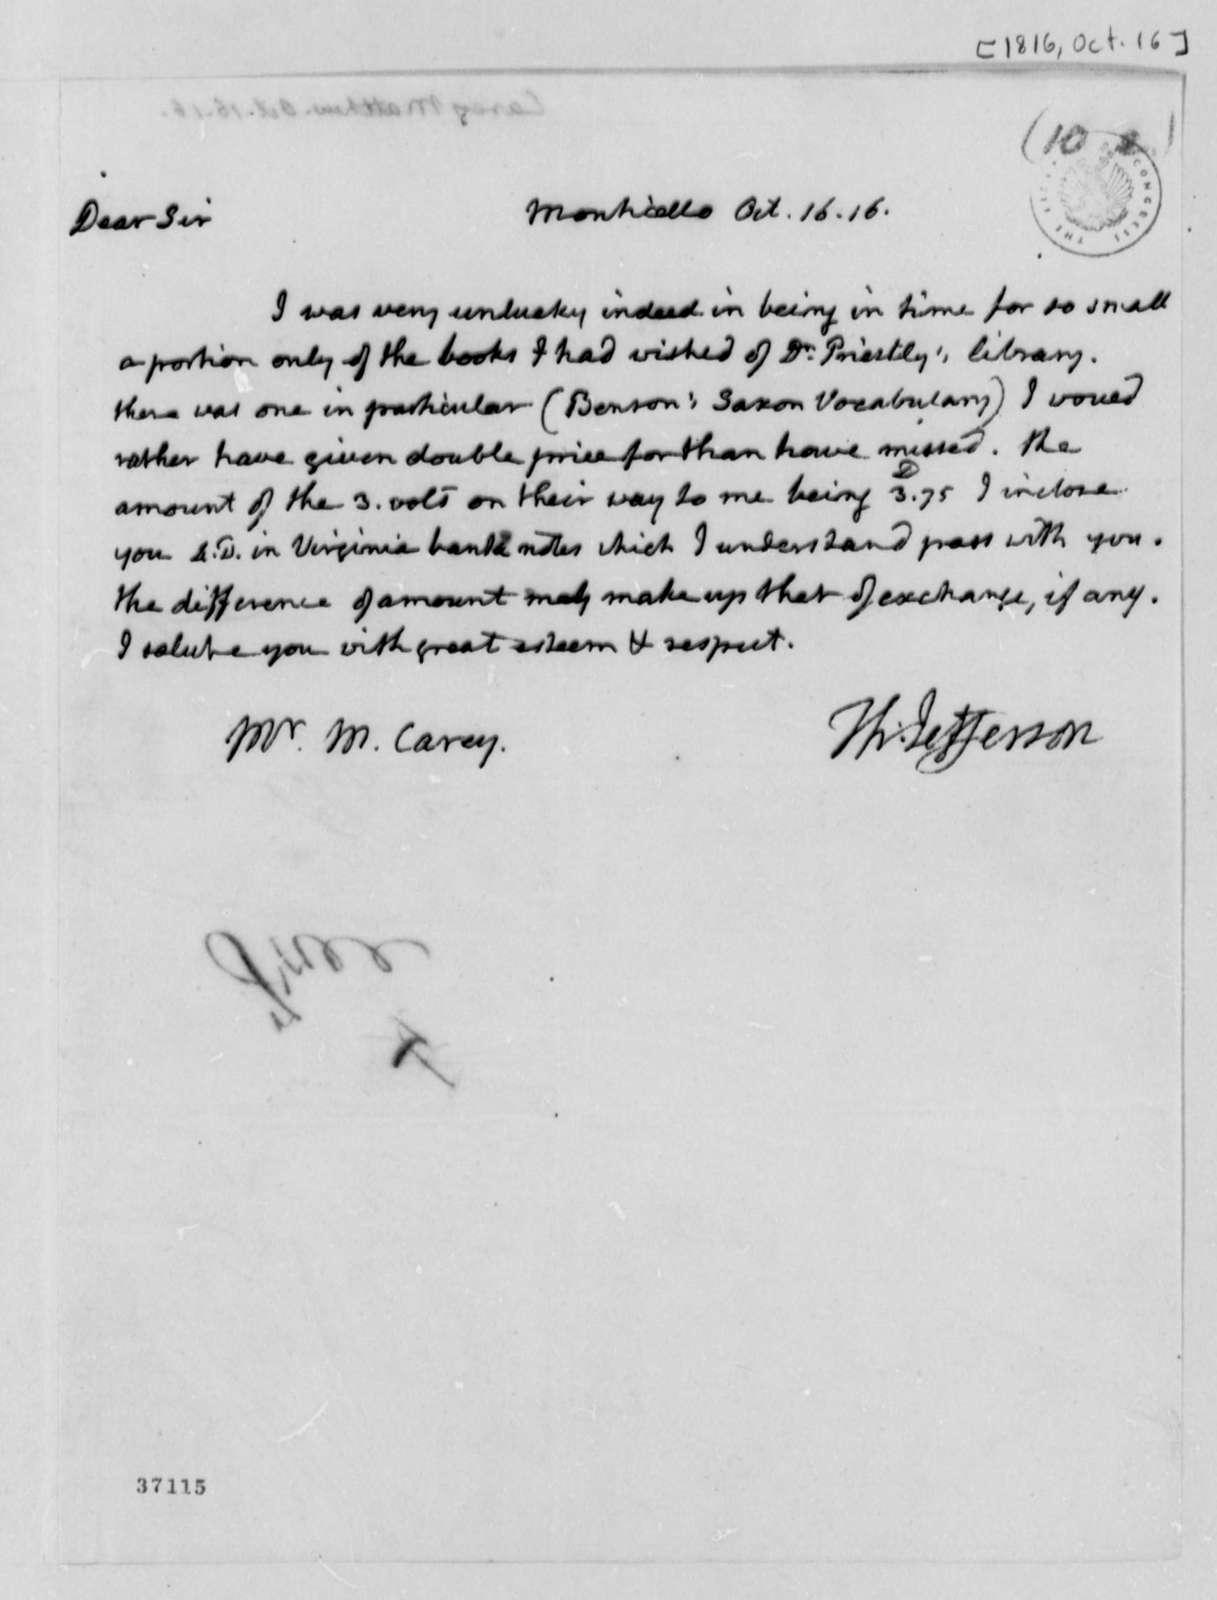 Thomas Jefferson to Matthew Carey, October 16, 1816